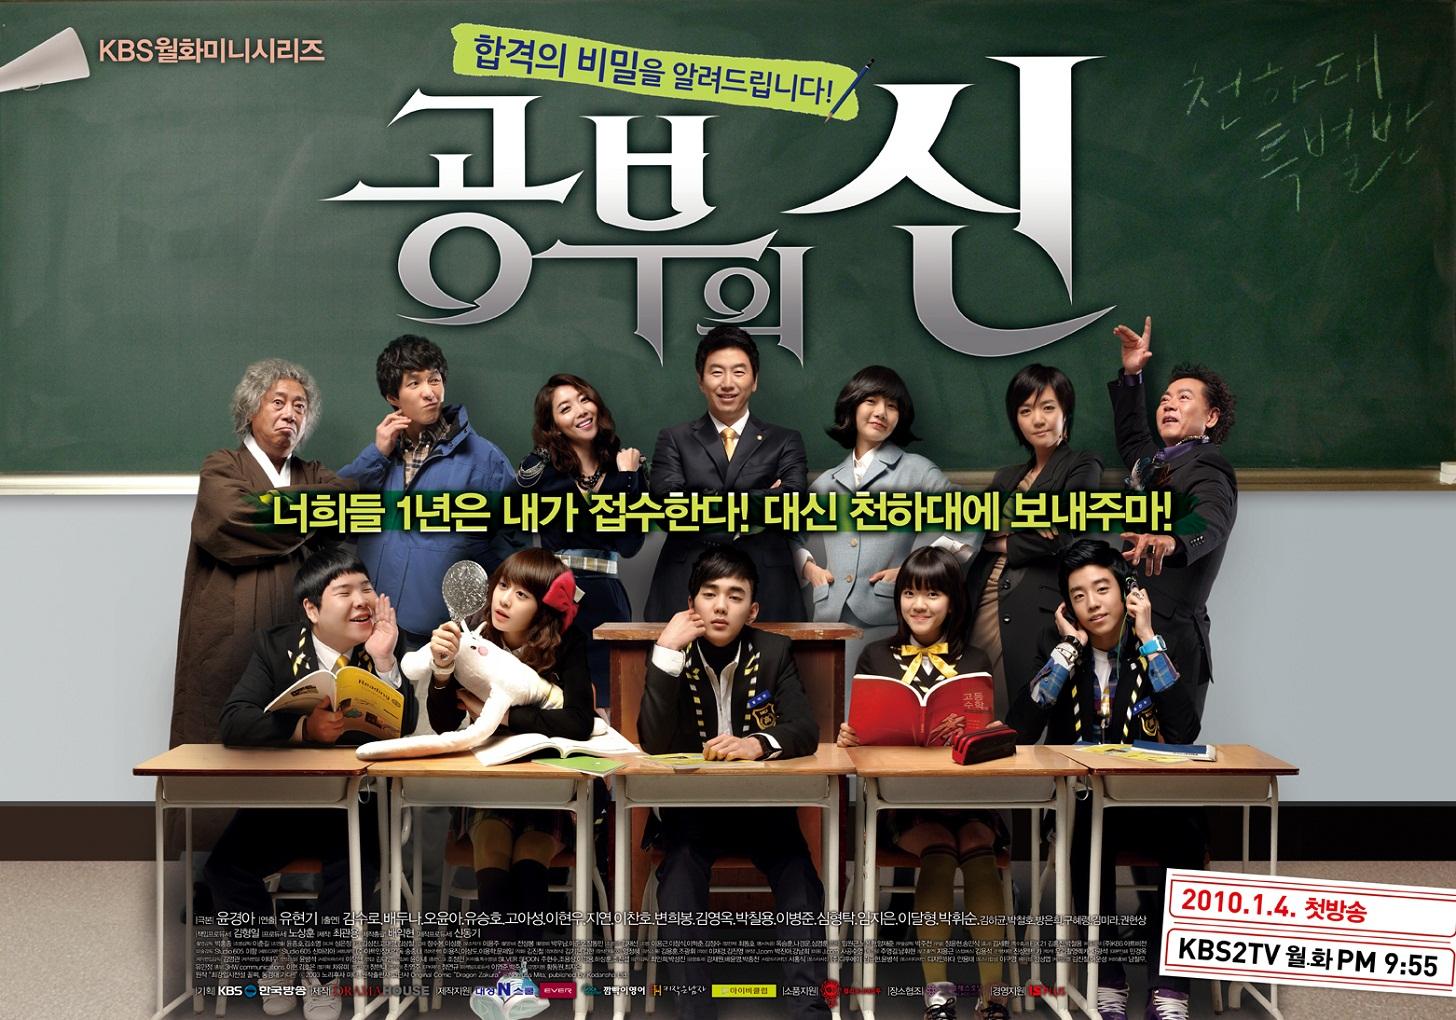 YESASIA: God of Study OST (KBS TV Drama) CD - T-max ...